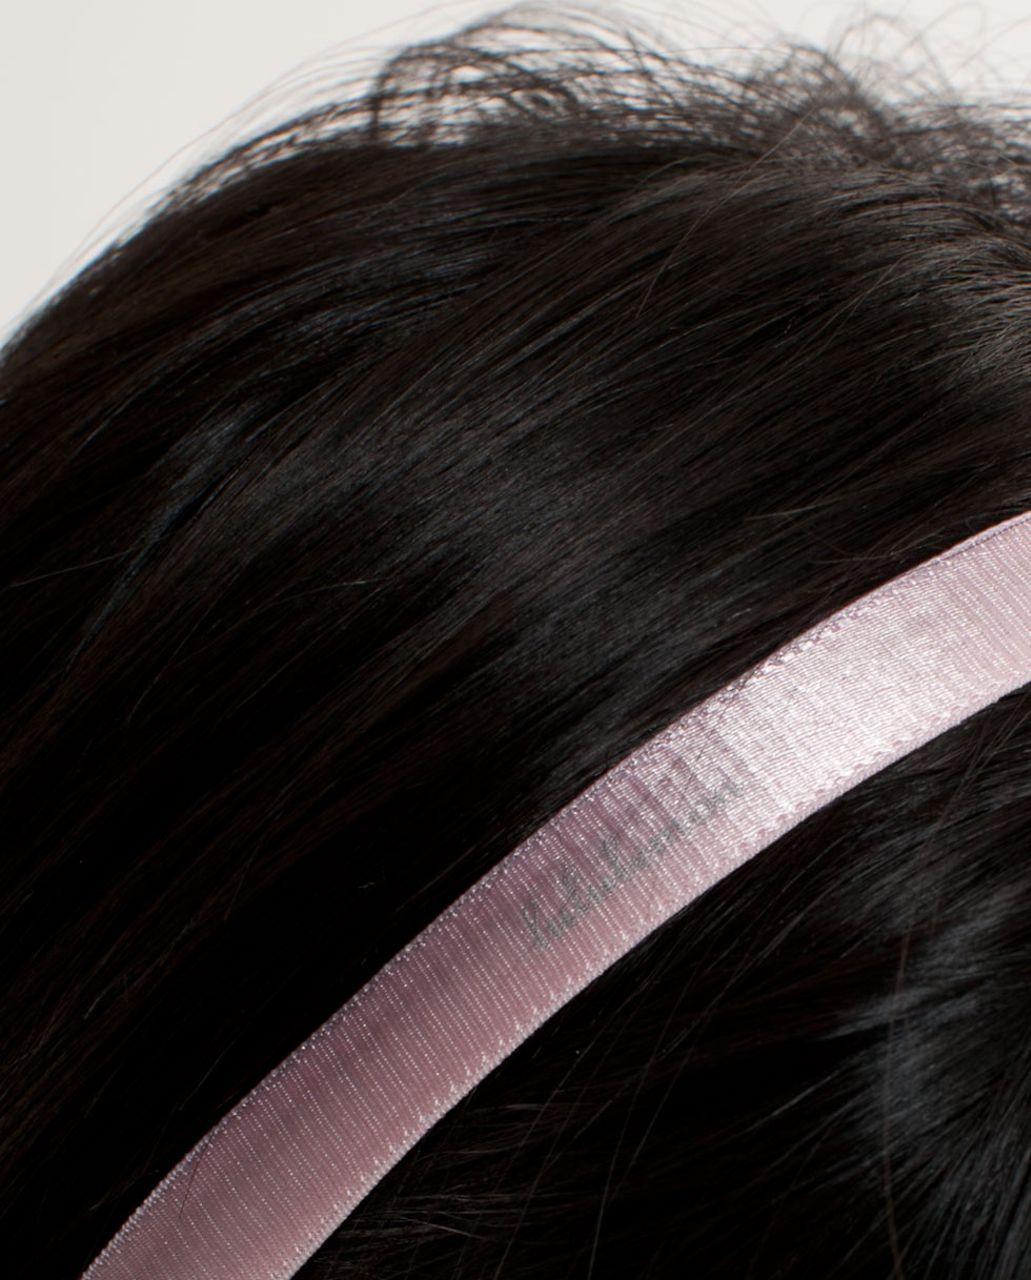 Lululemon Skinny Satin Pirouette - Pig Pink